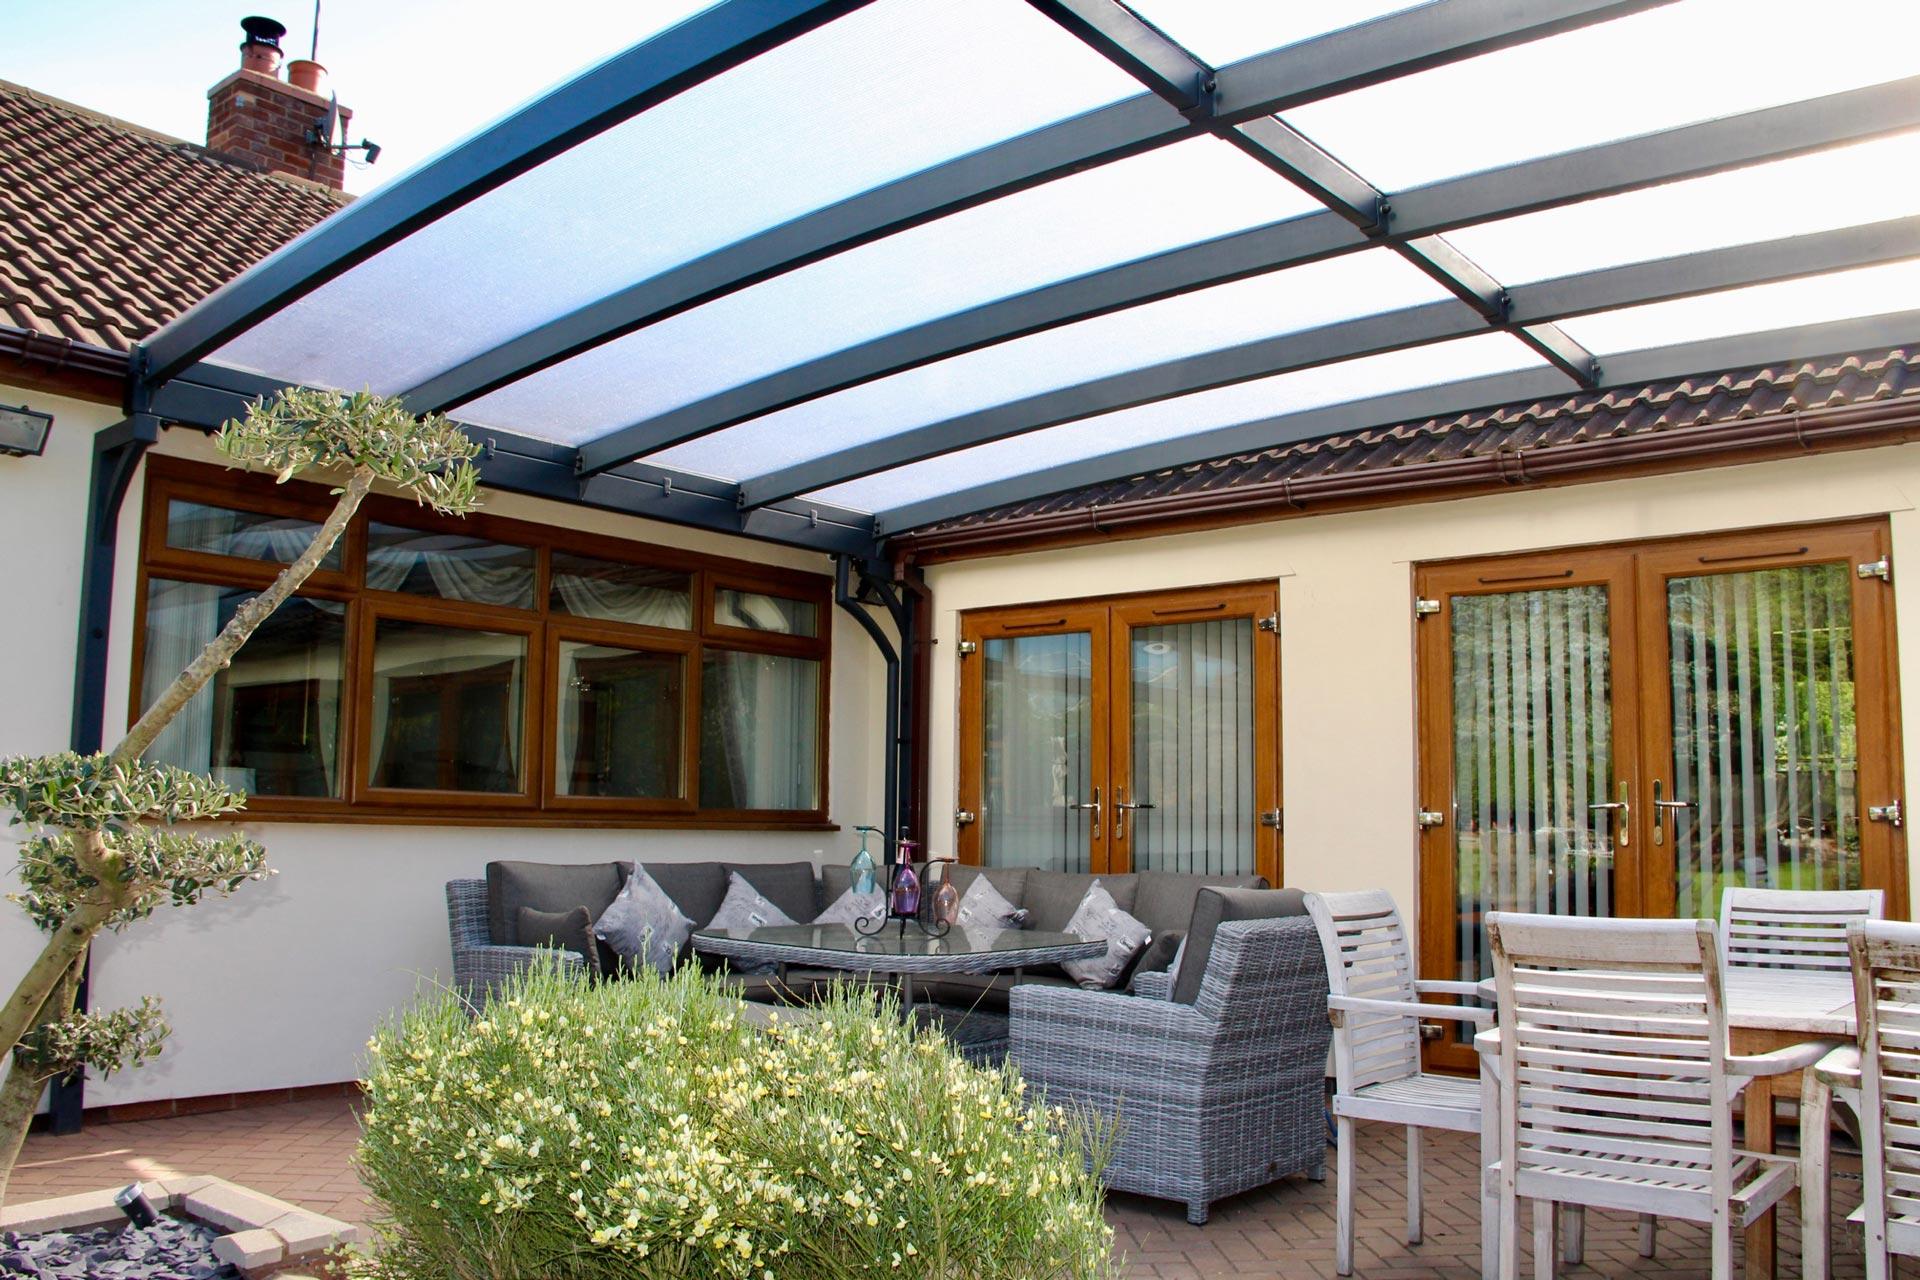 patio-canopy-home   Kappion Carports & Canopies